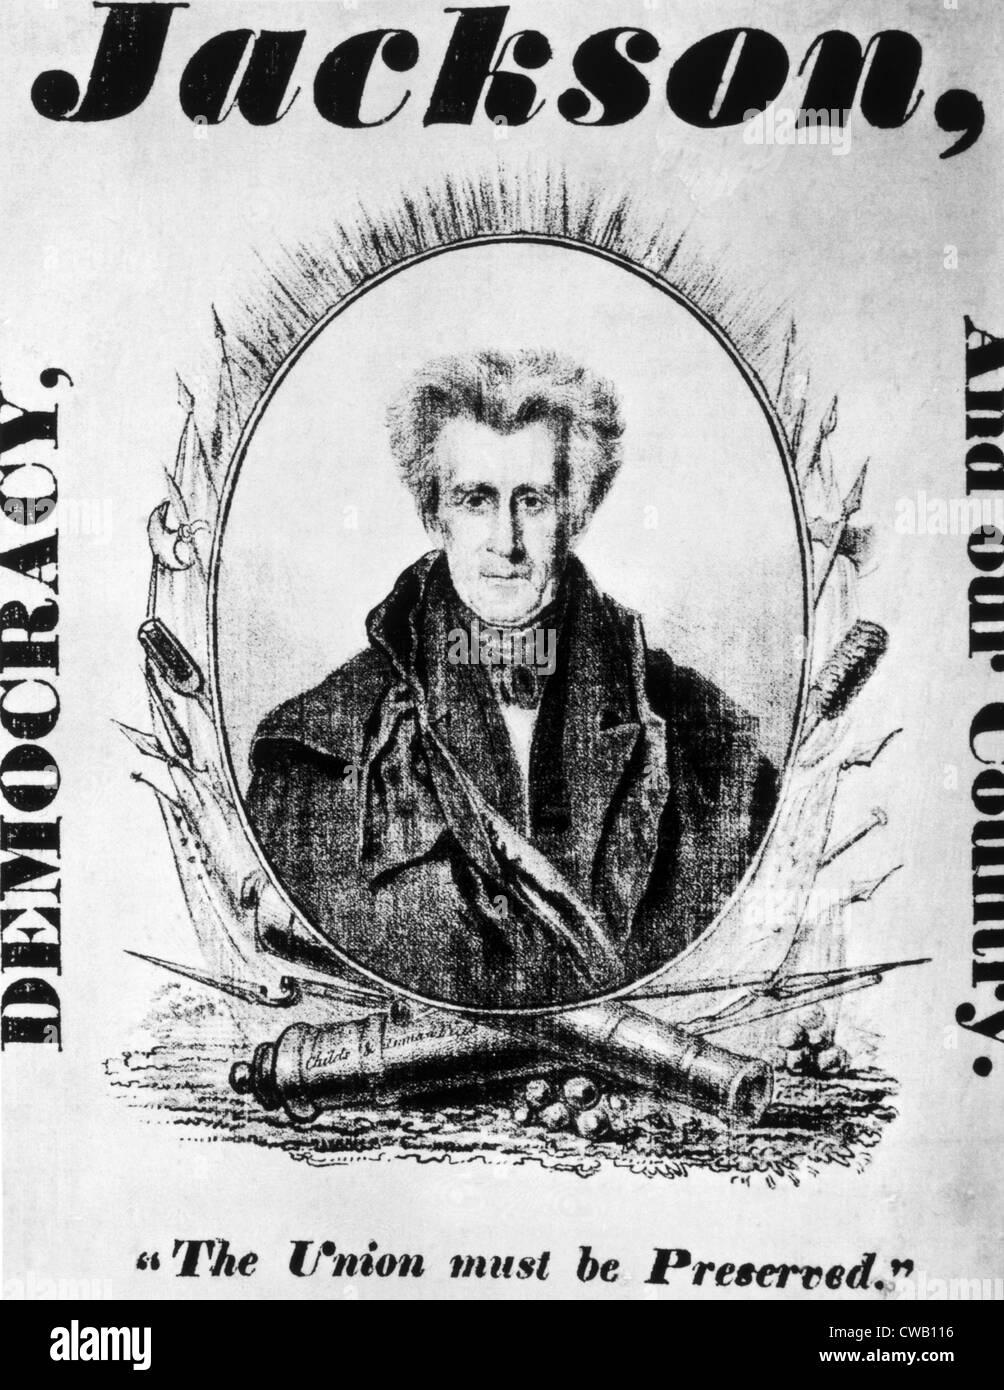 Andrew Jackson campagna presidenziale poster, 1832 Immagini Stock